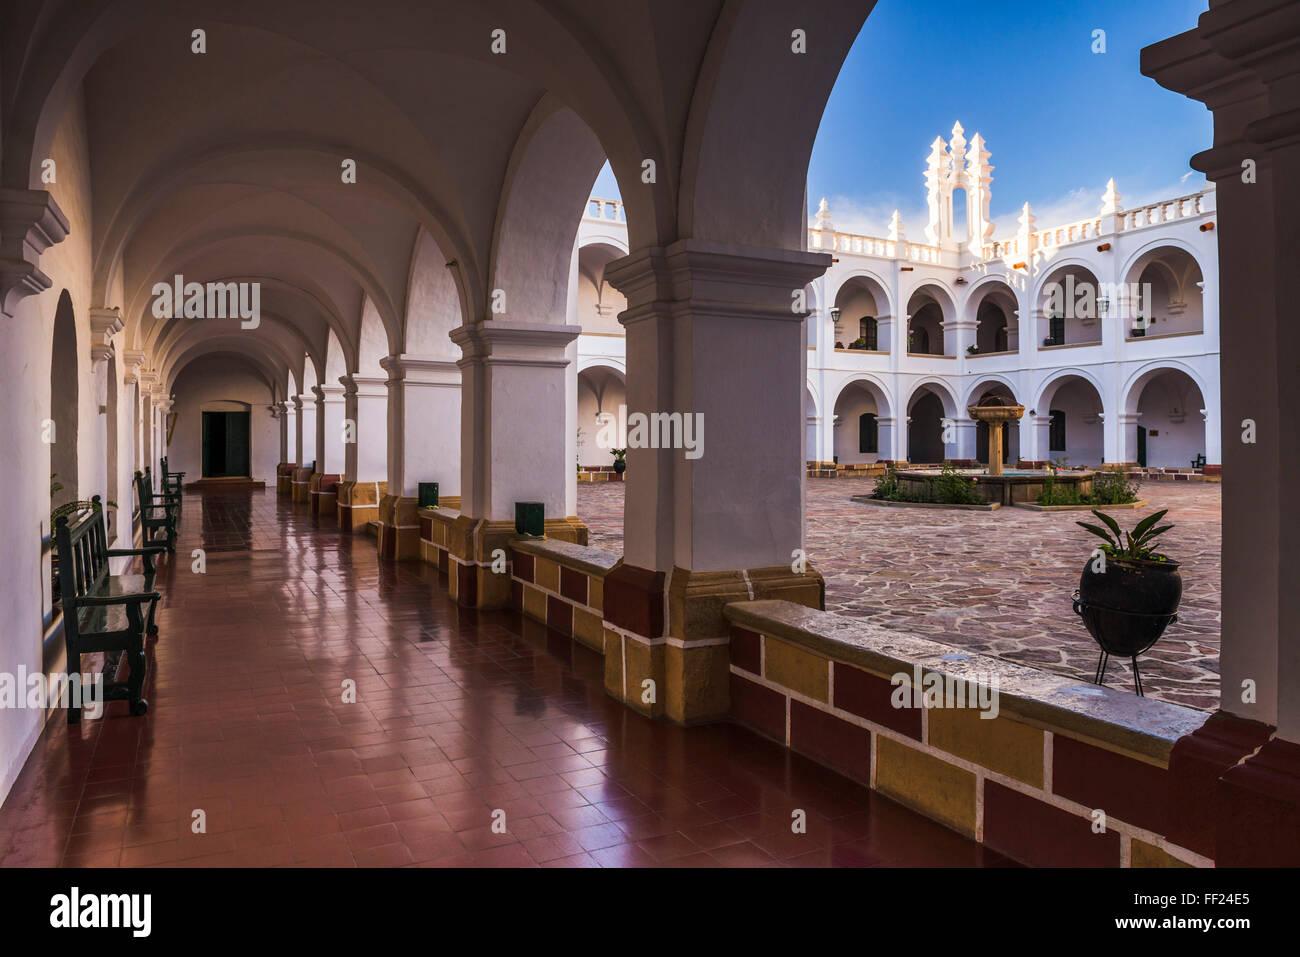 Universidad San Francisco Xavier de Chuquisaca (University of Saint Francis Xavier), Historic City of Sucre, UNESCO, - Stock Image